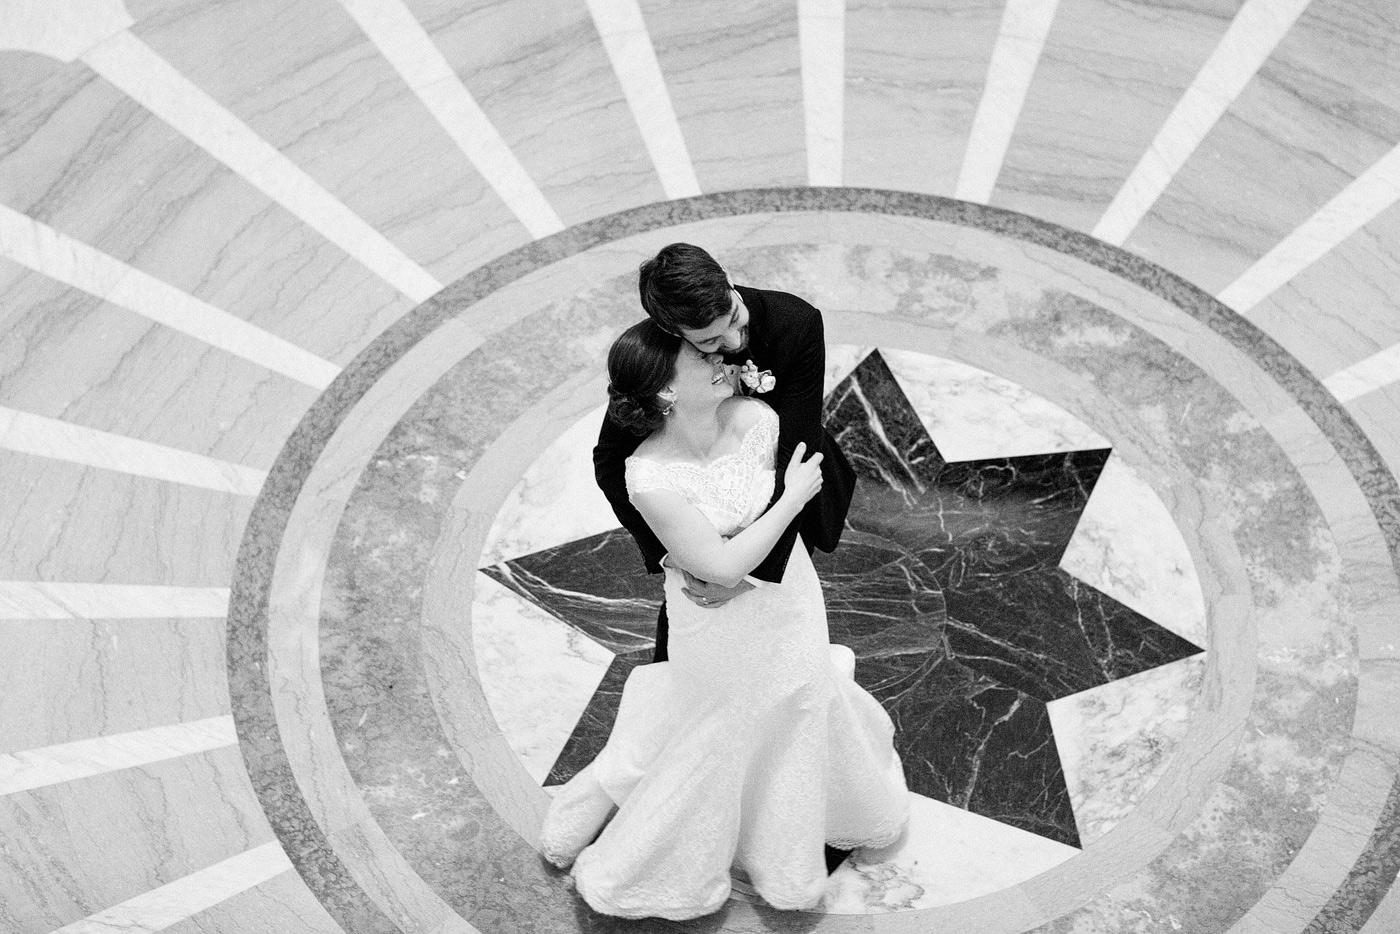 CARNEGIE INSTITUTE for SCIENCE winter wedding